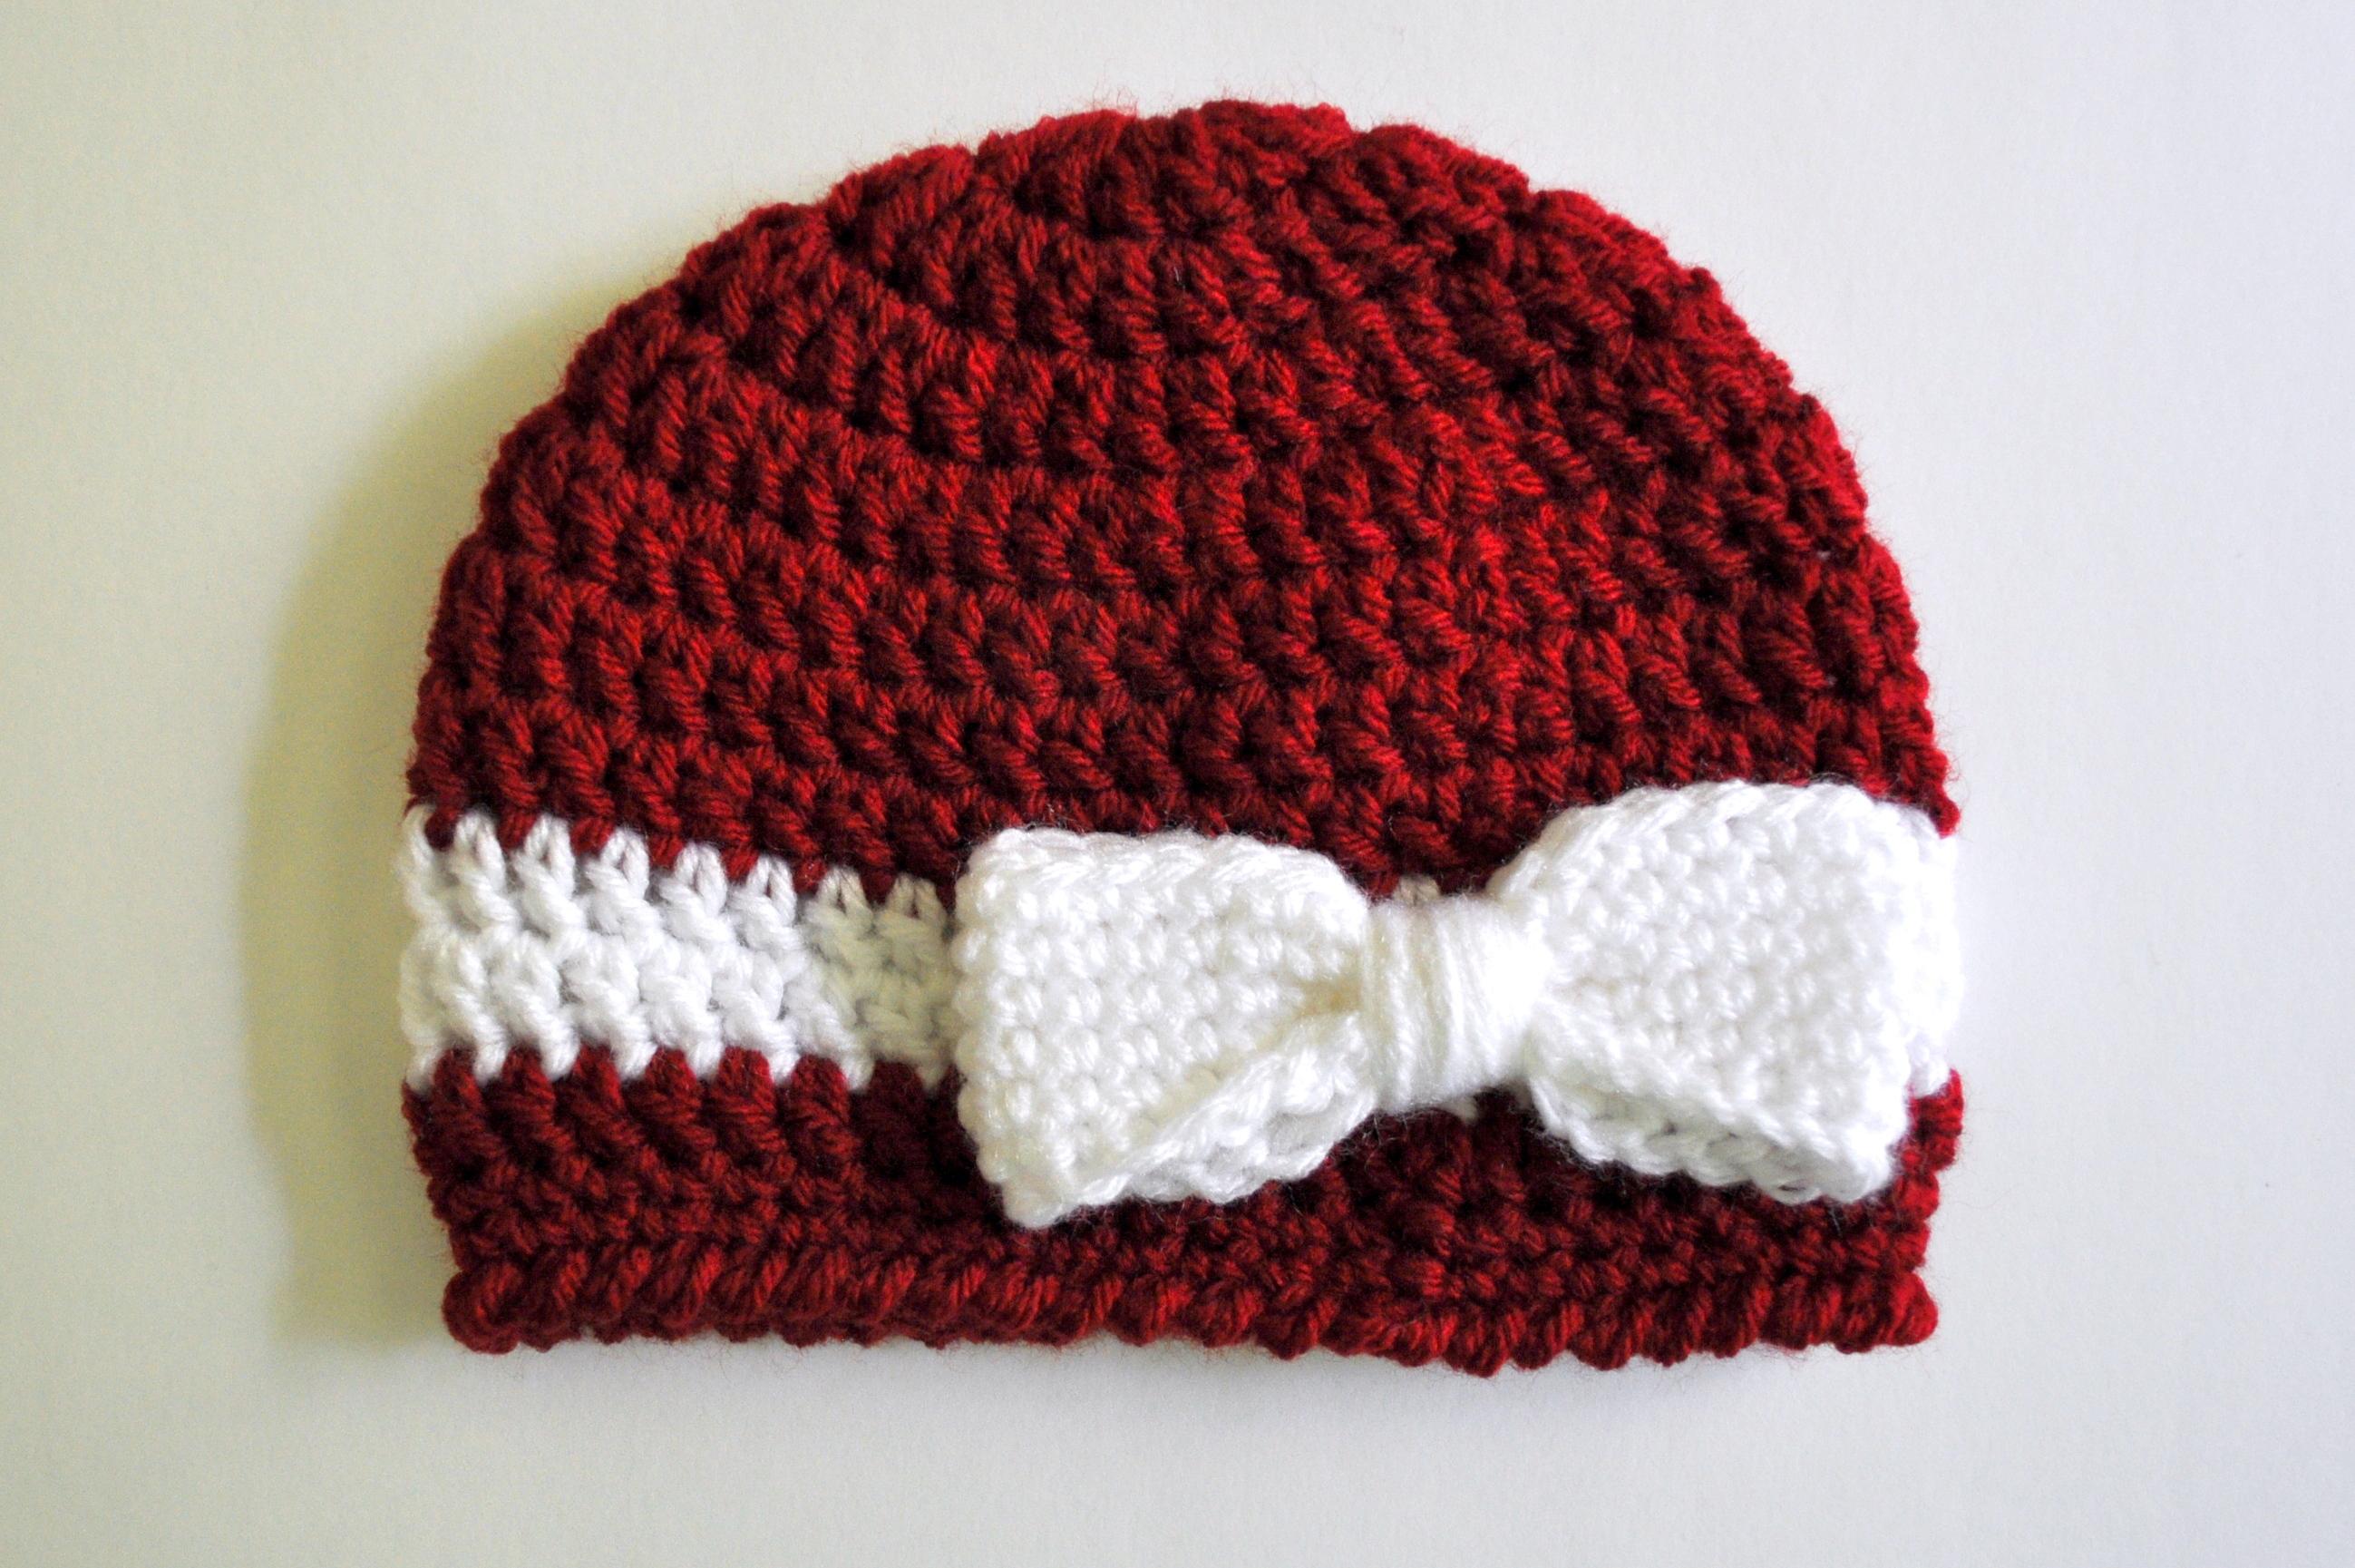 pattern Classy Crochet Page 2